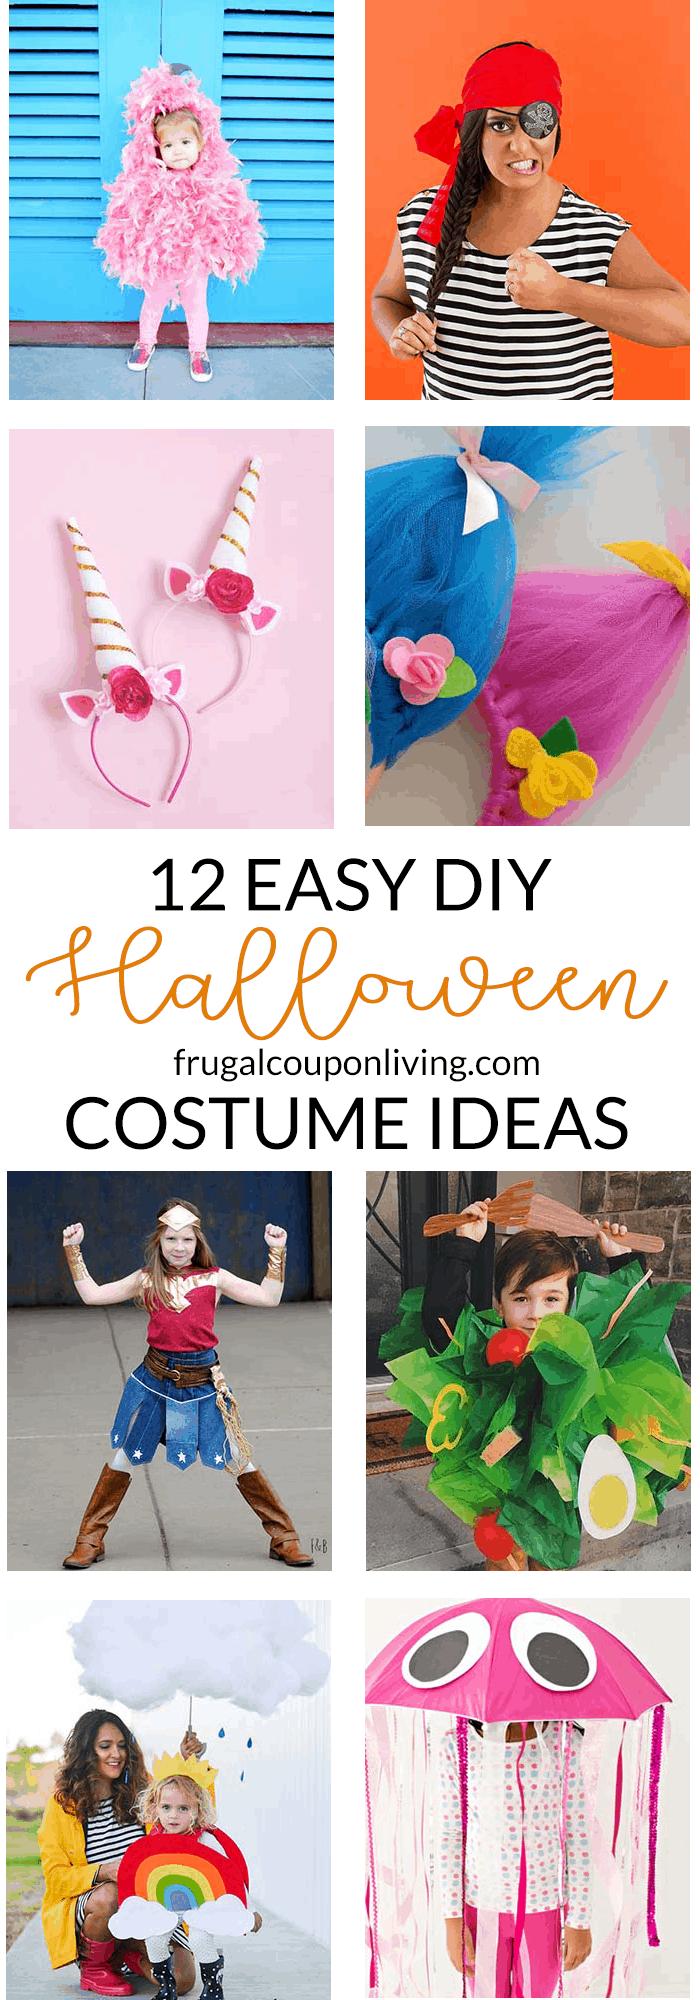 12 Easy DIY Halloween Costume Ideas